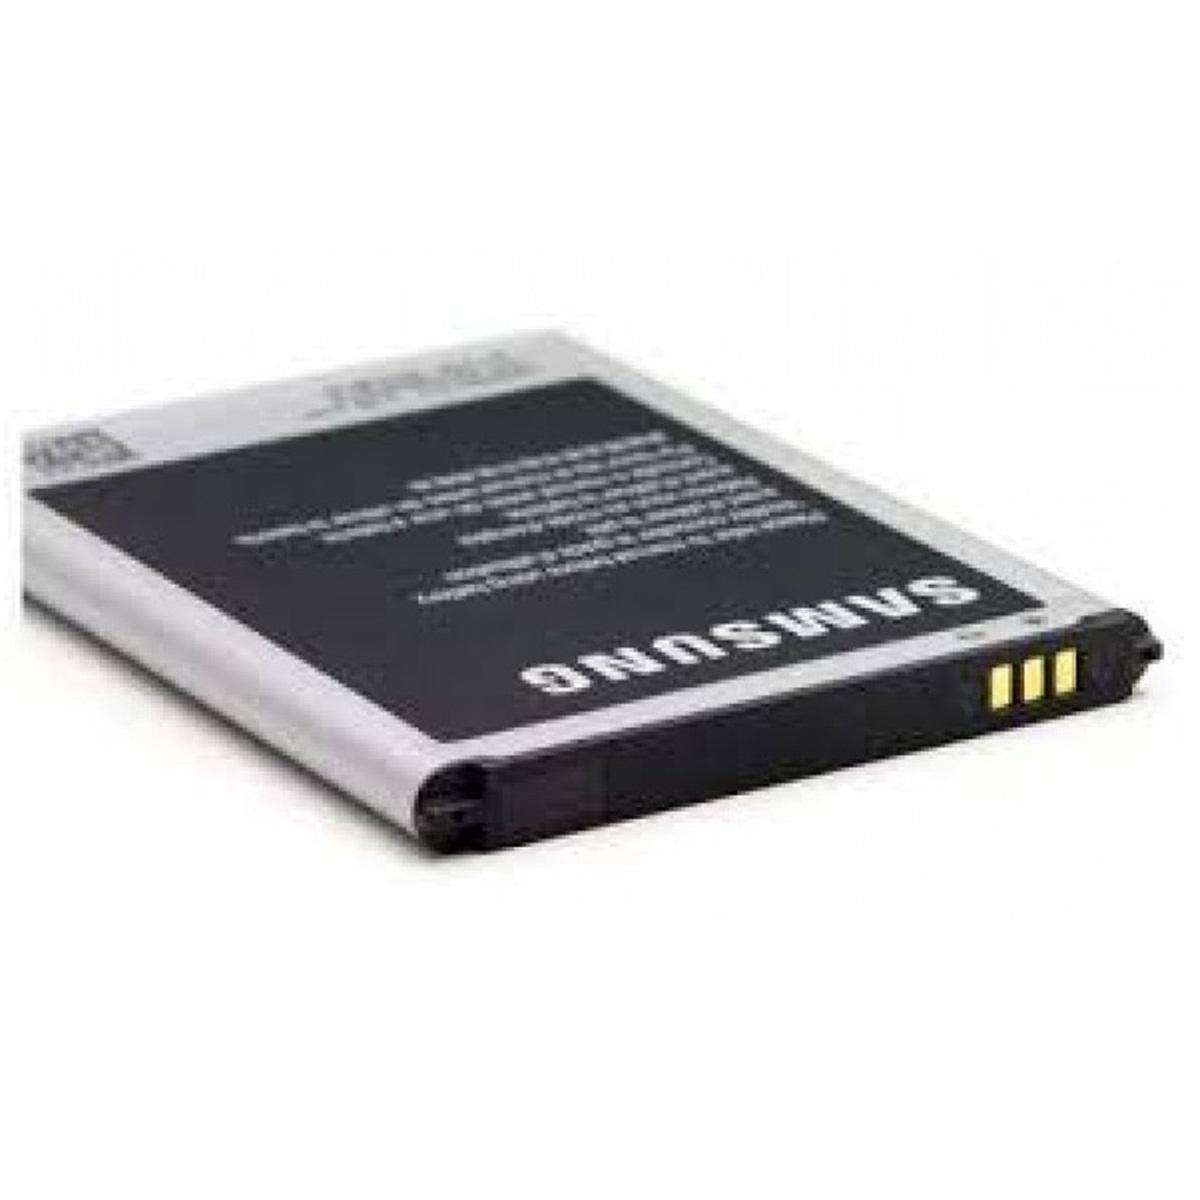 Samsung Baterai Galaxy Ace 3 GT-S7272 / S7270 Original ...